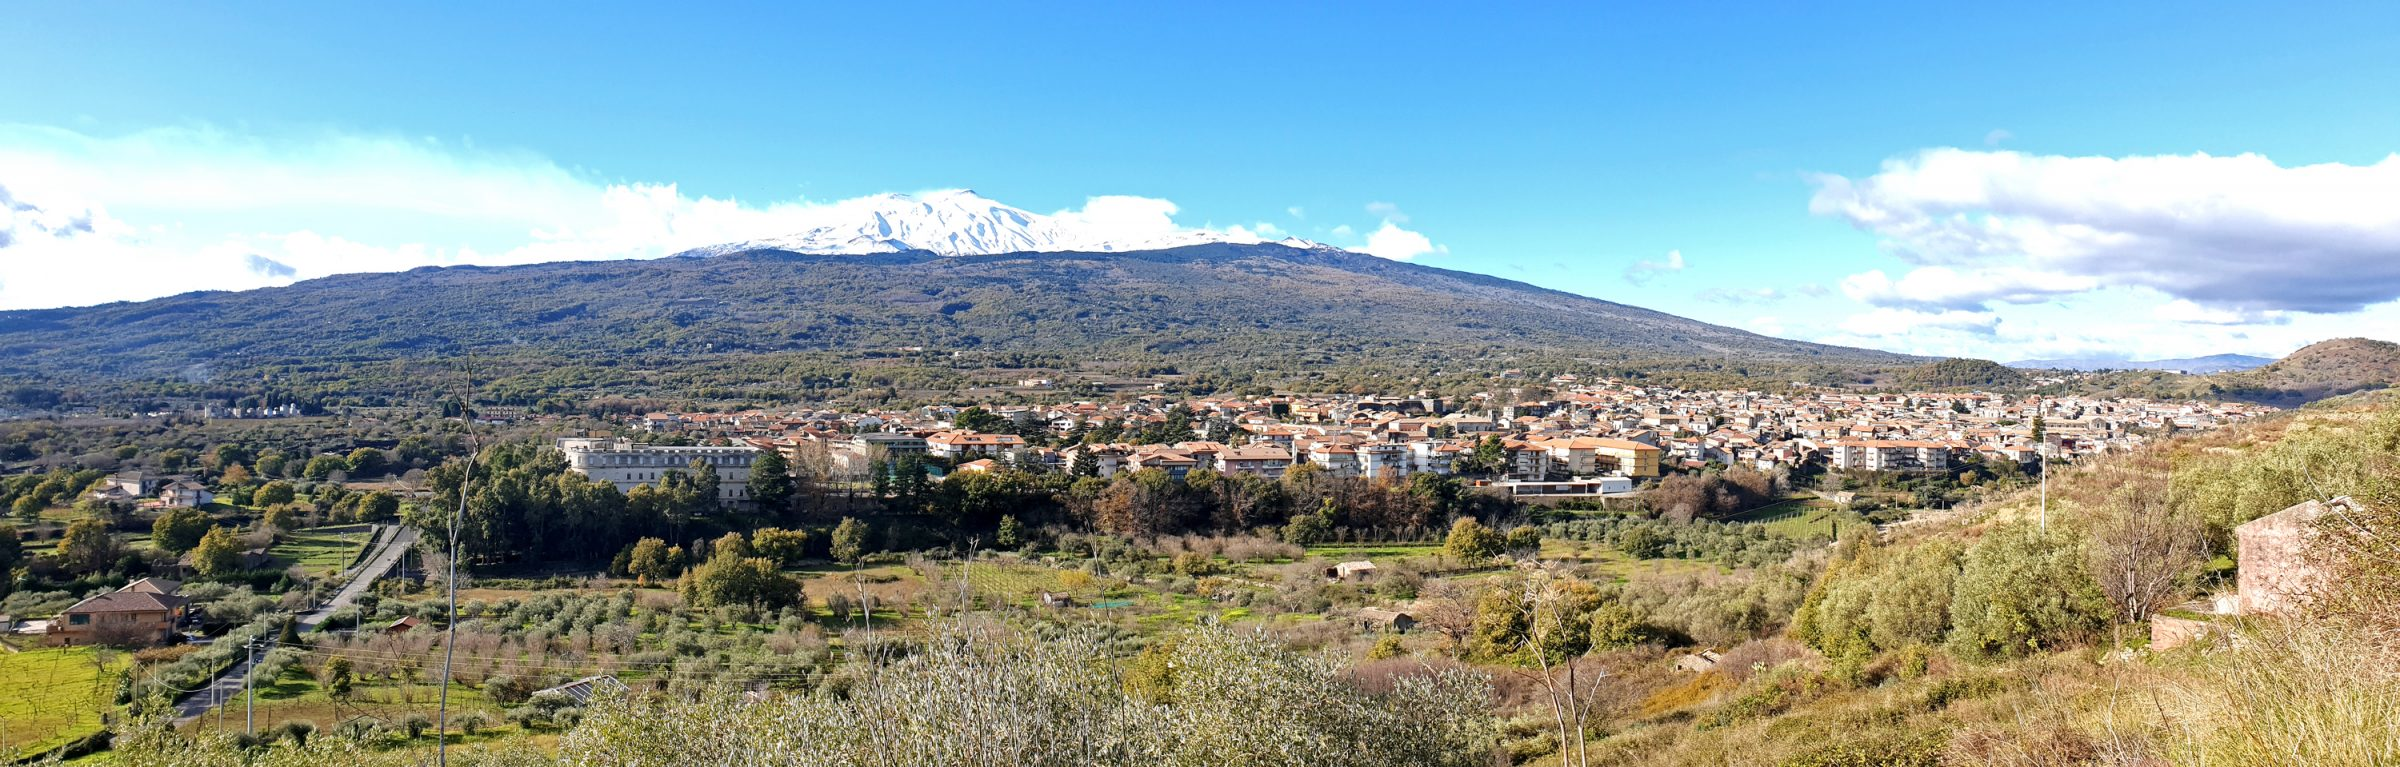 linguaglossa etna nord paesaggio vulcano etna